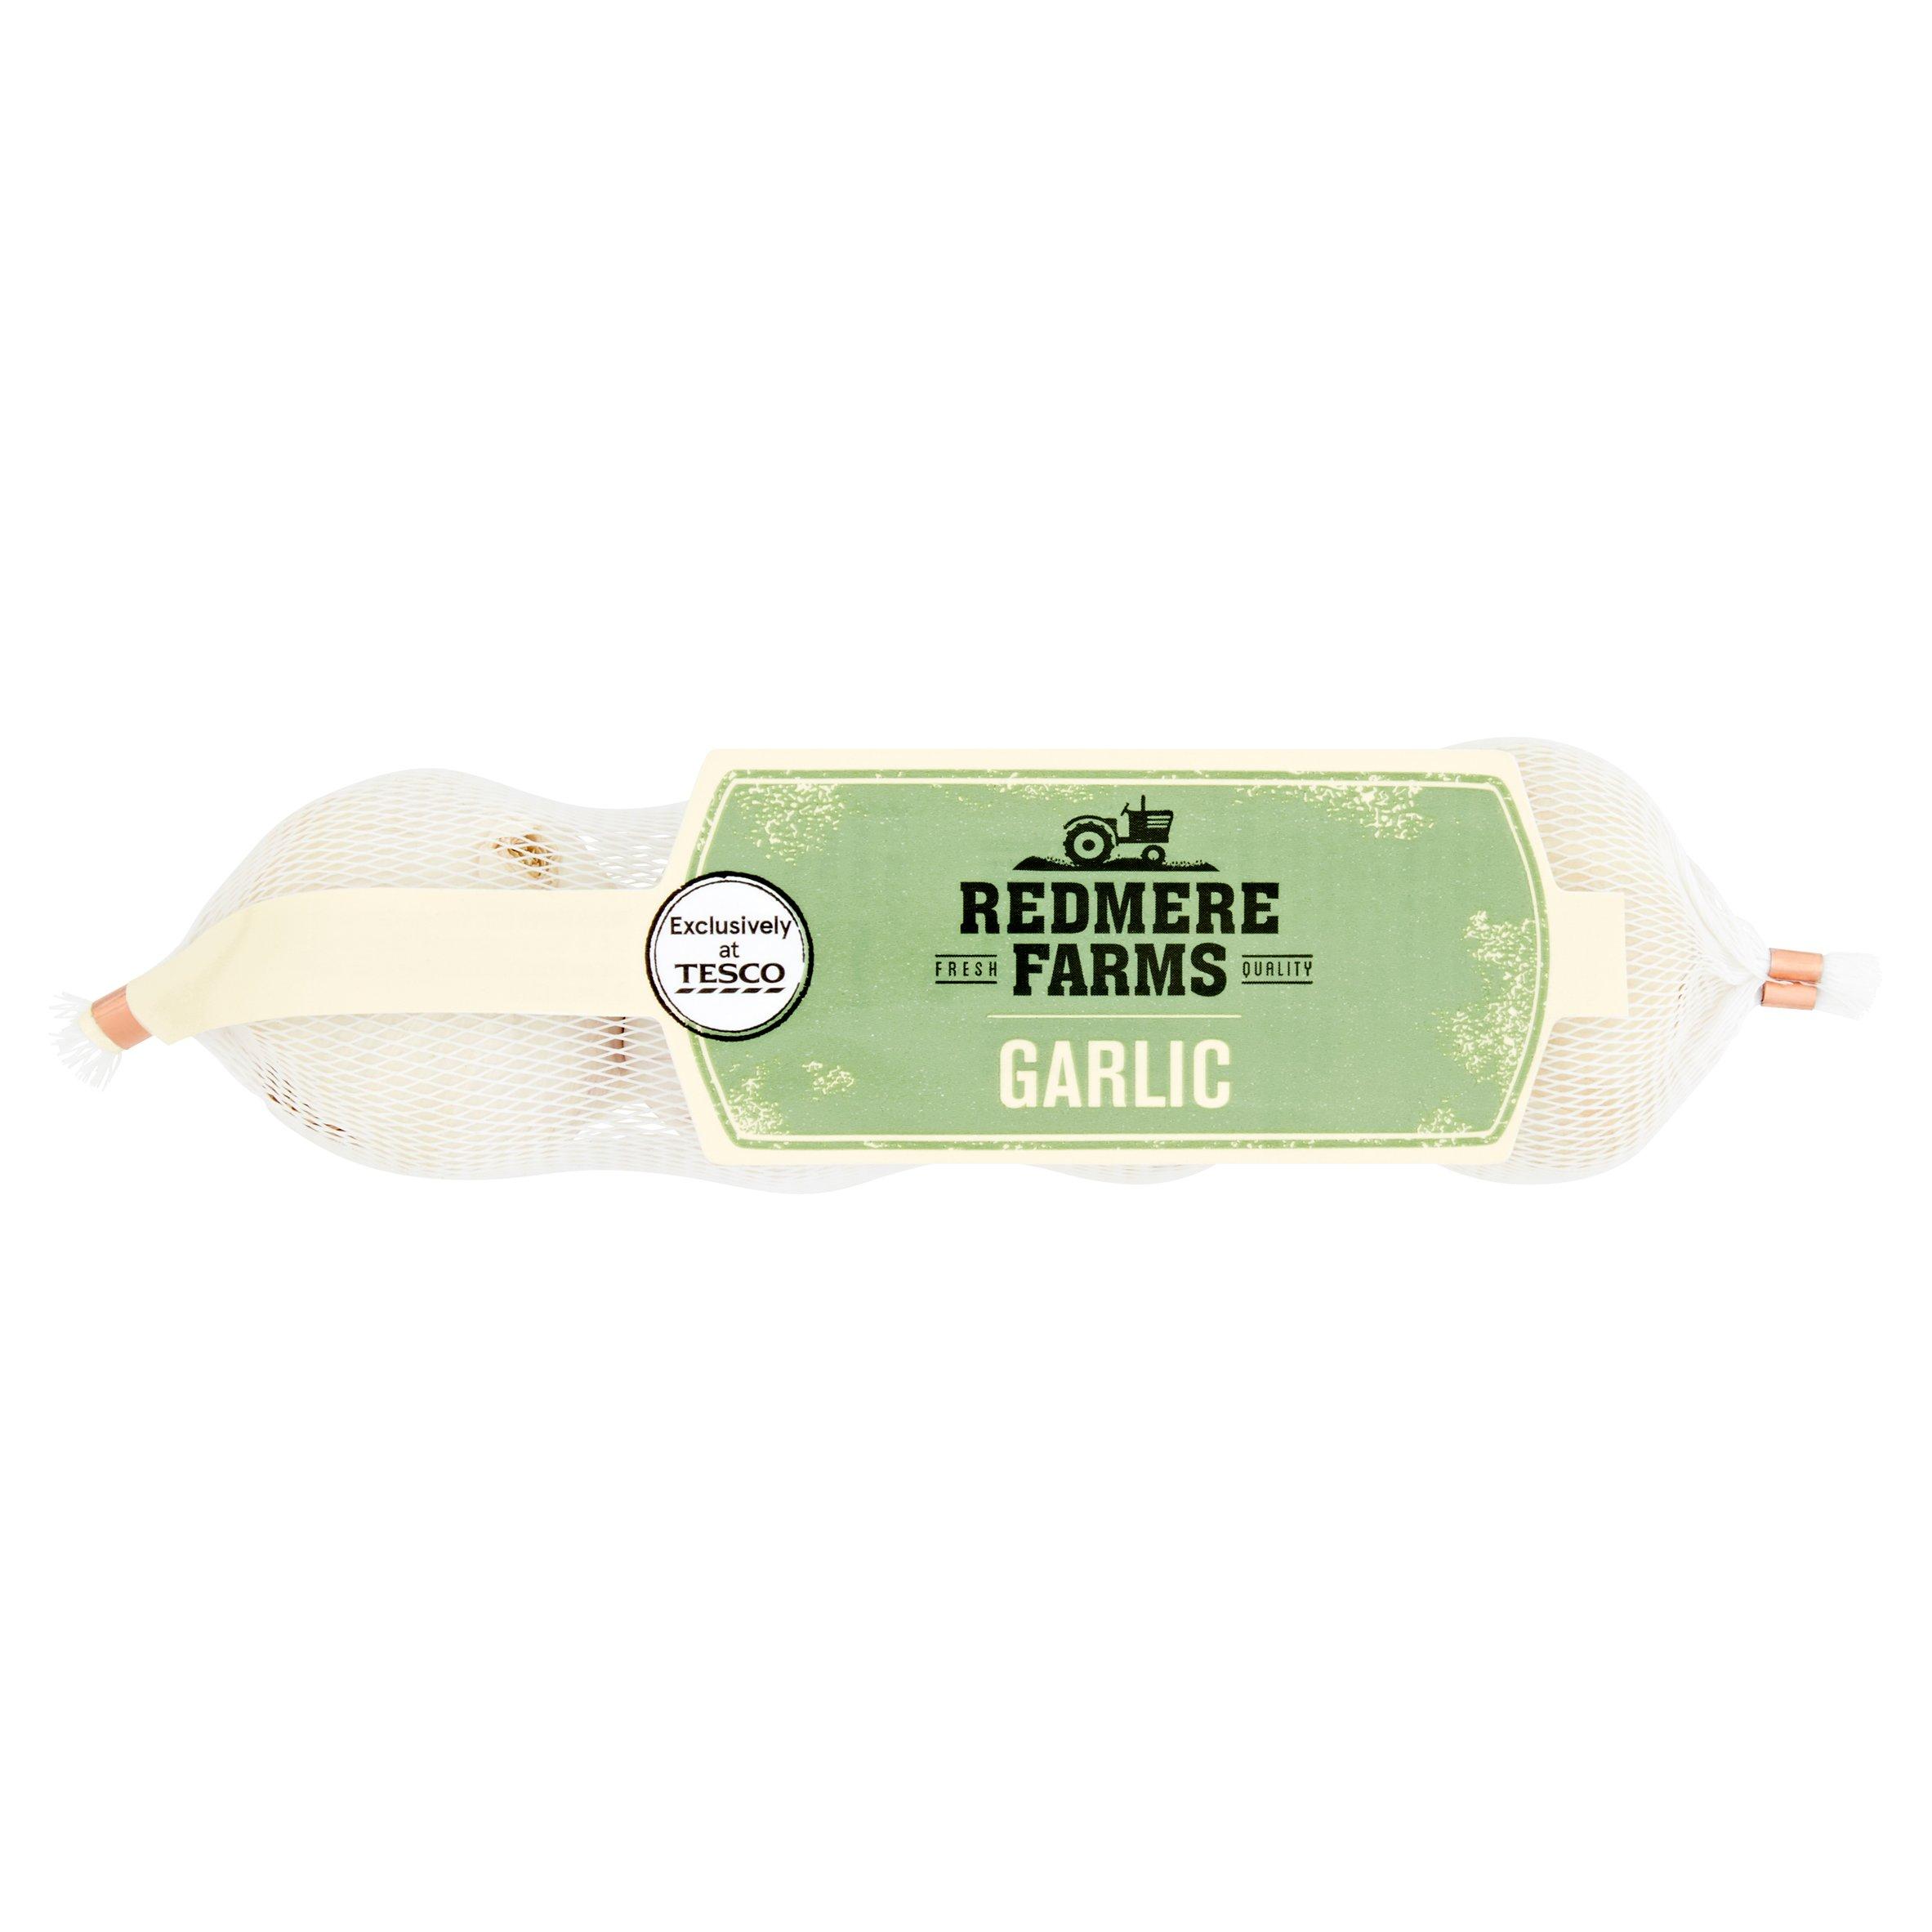 Redmere Farms Garlic 4 Pack